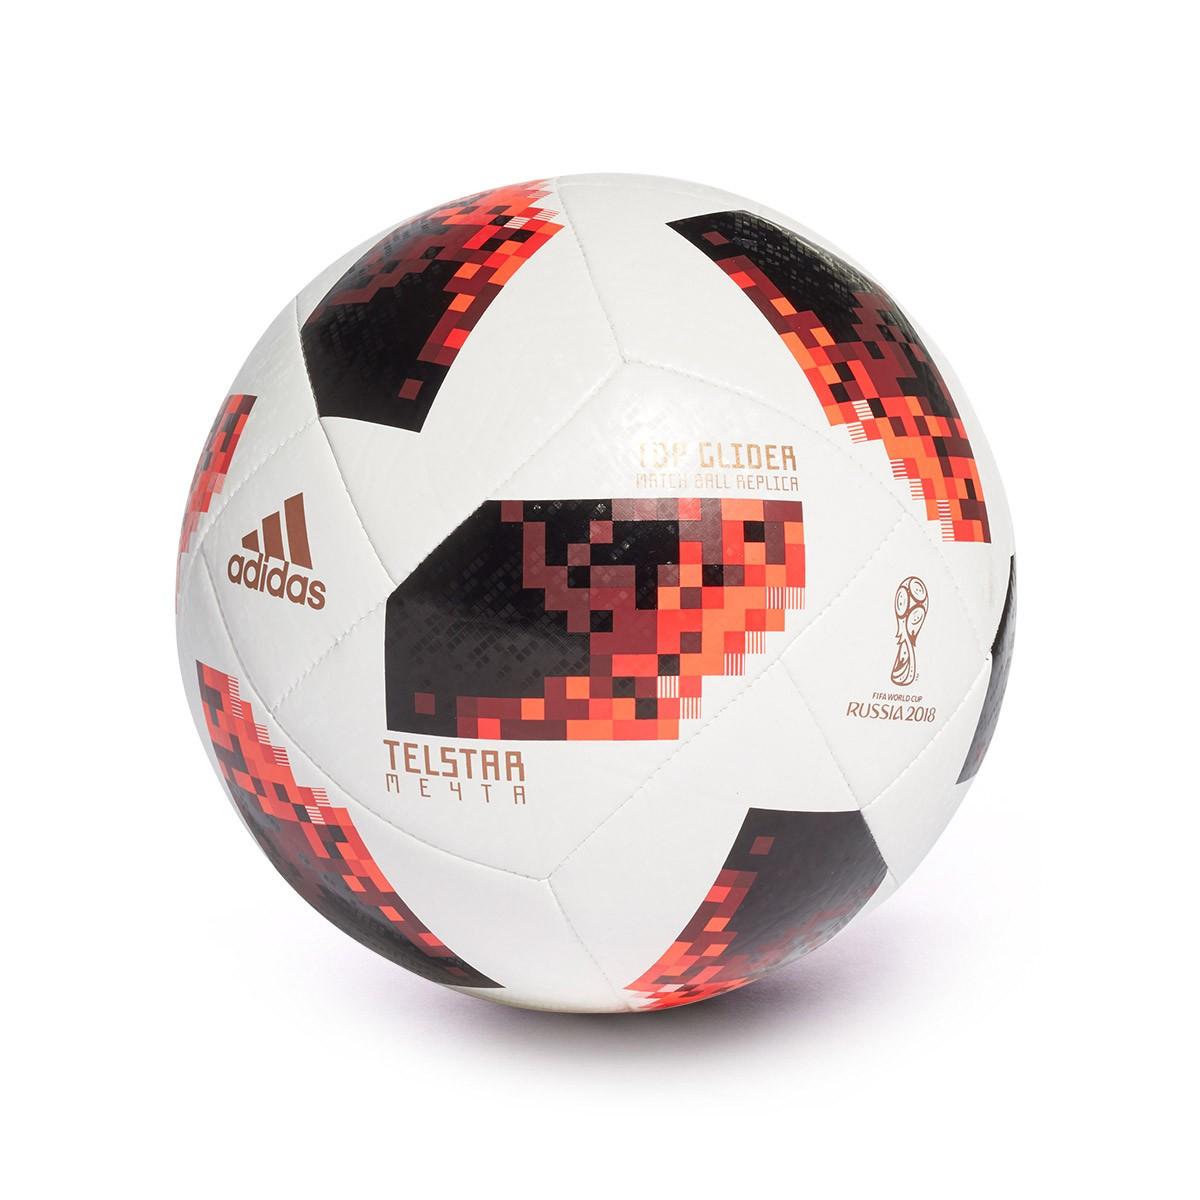 Bola de Futebol adidas World Cup KO Top Glider White-Solar red-Black ... 86b84b3023e08